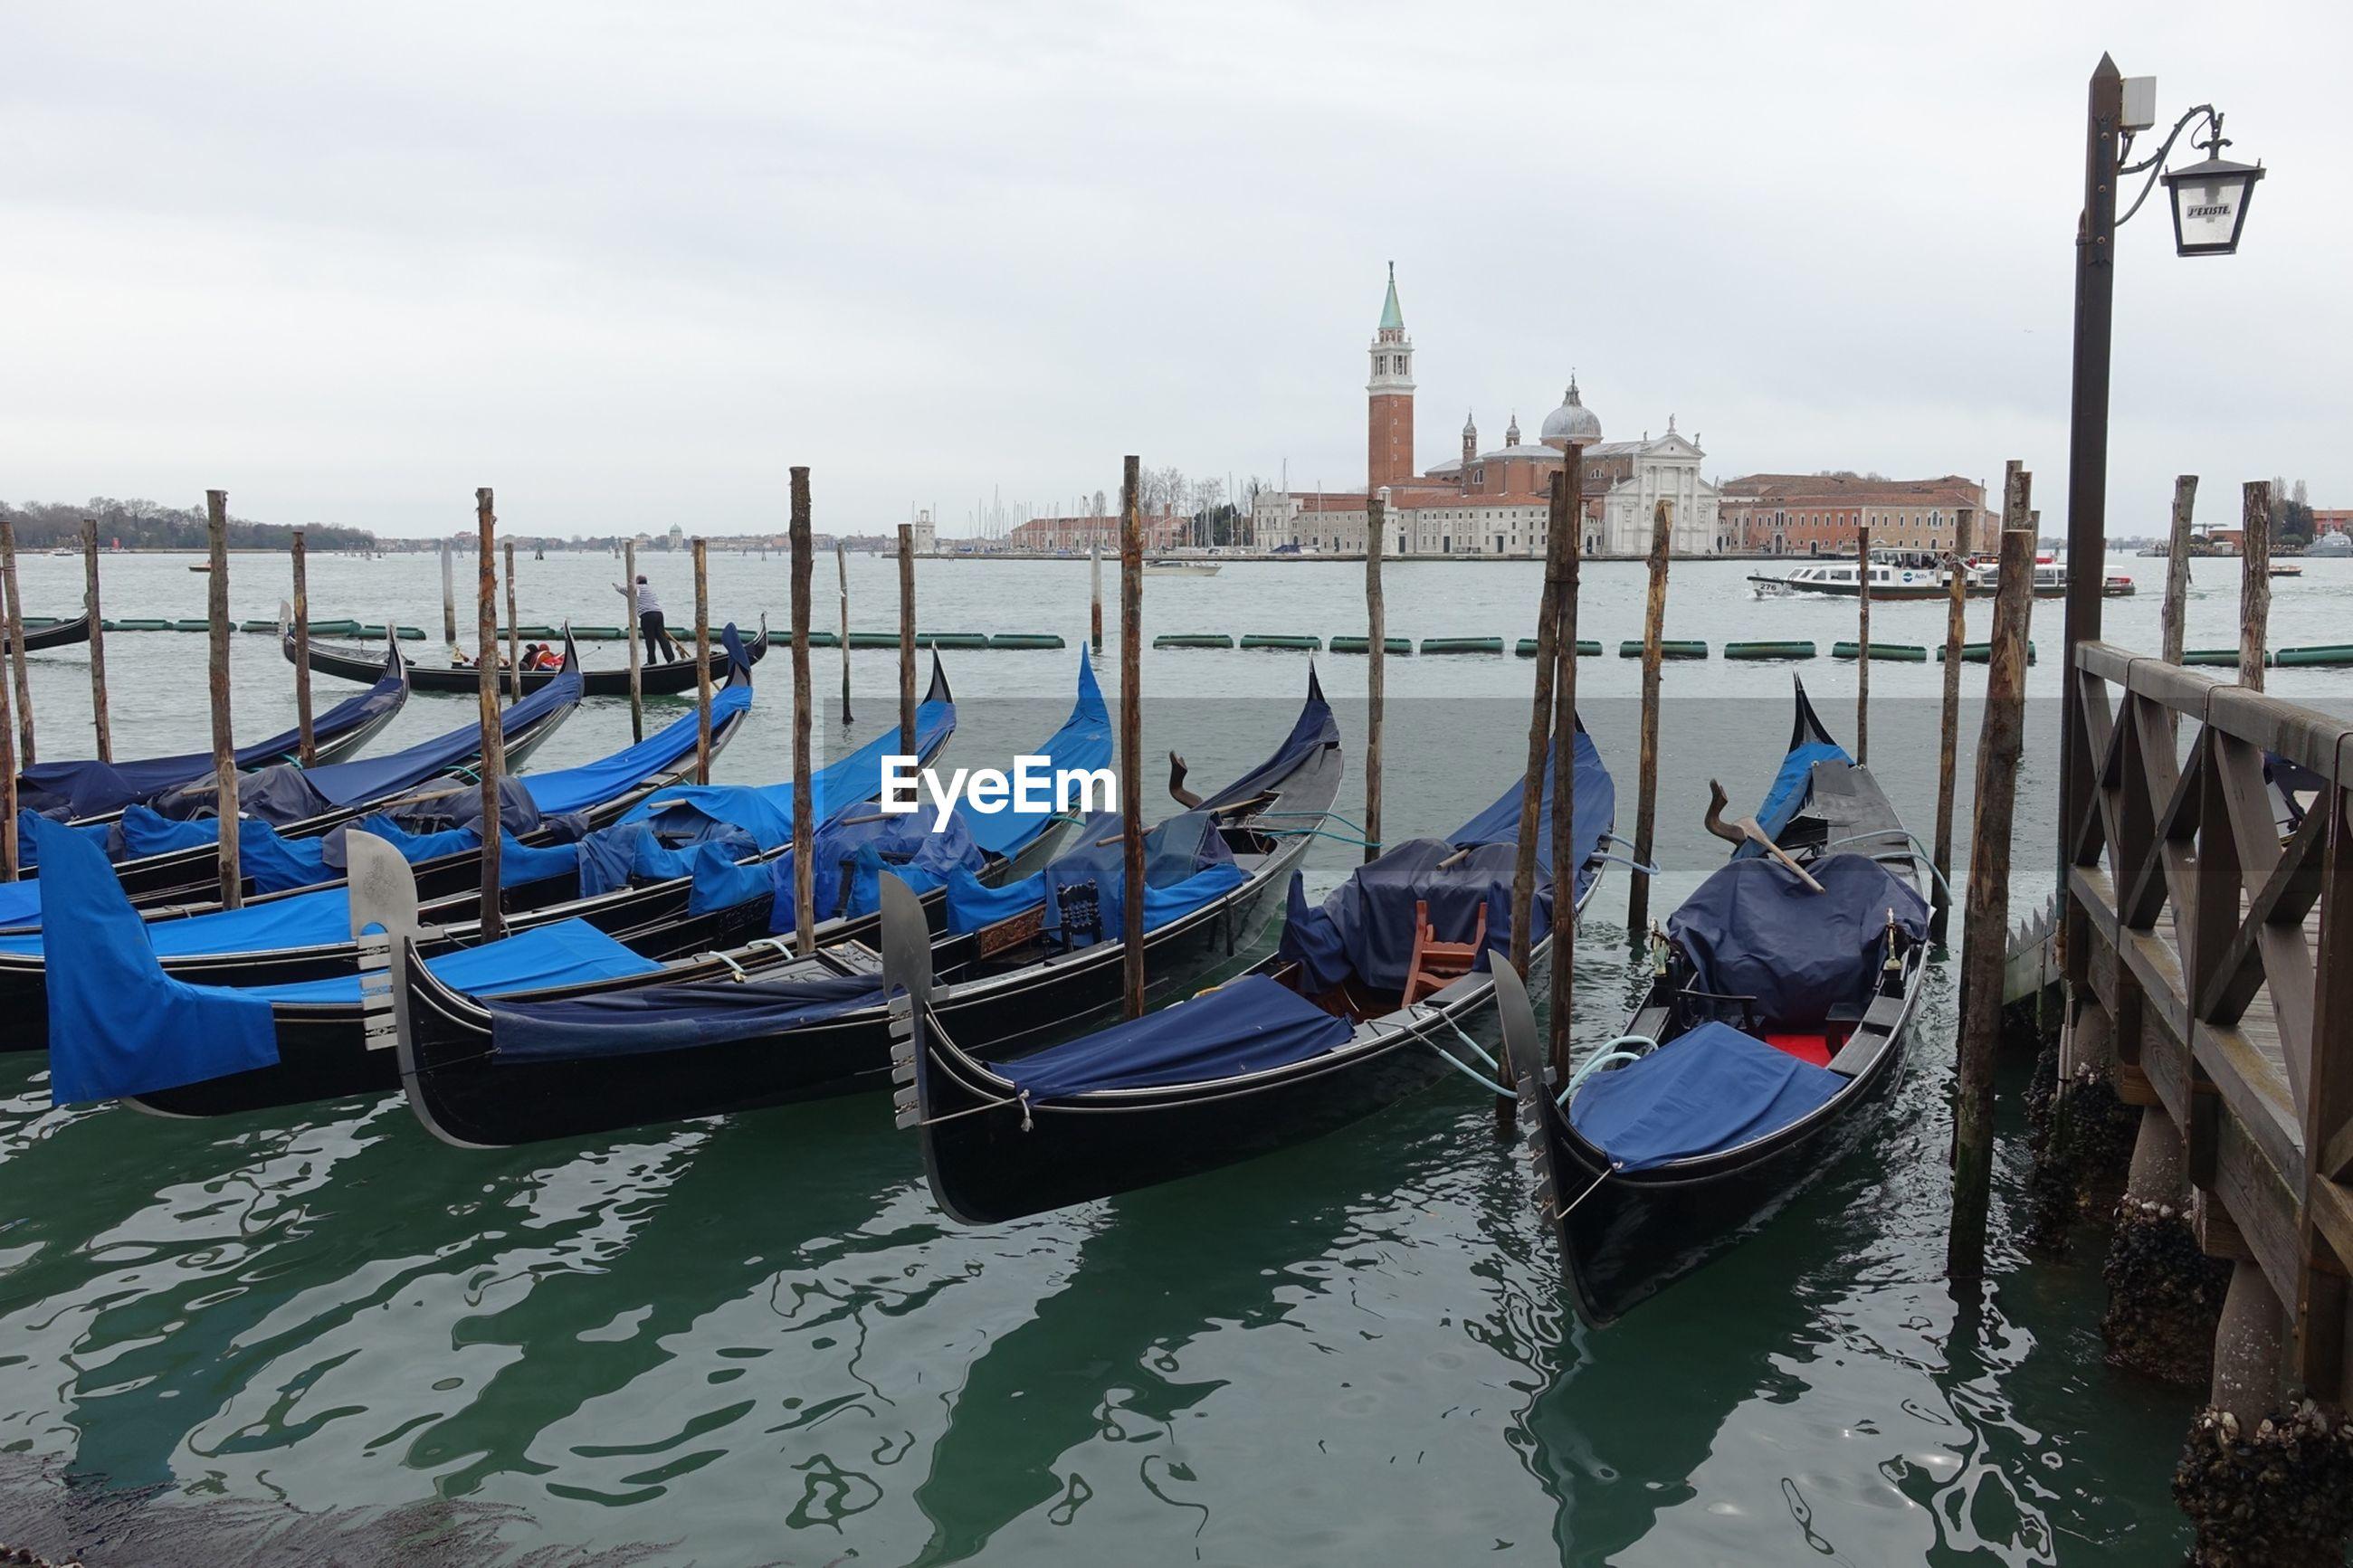 Gondolas moored on grand canal against clear sky